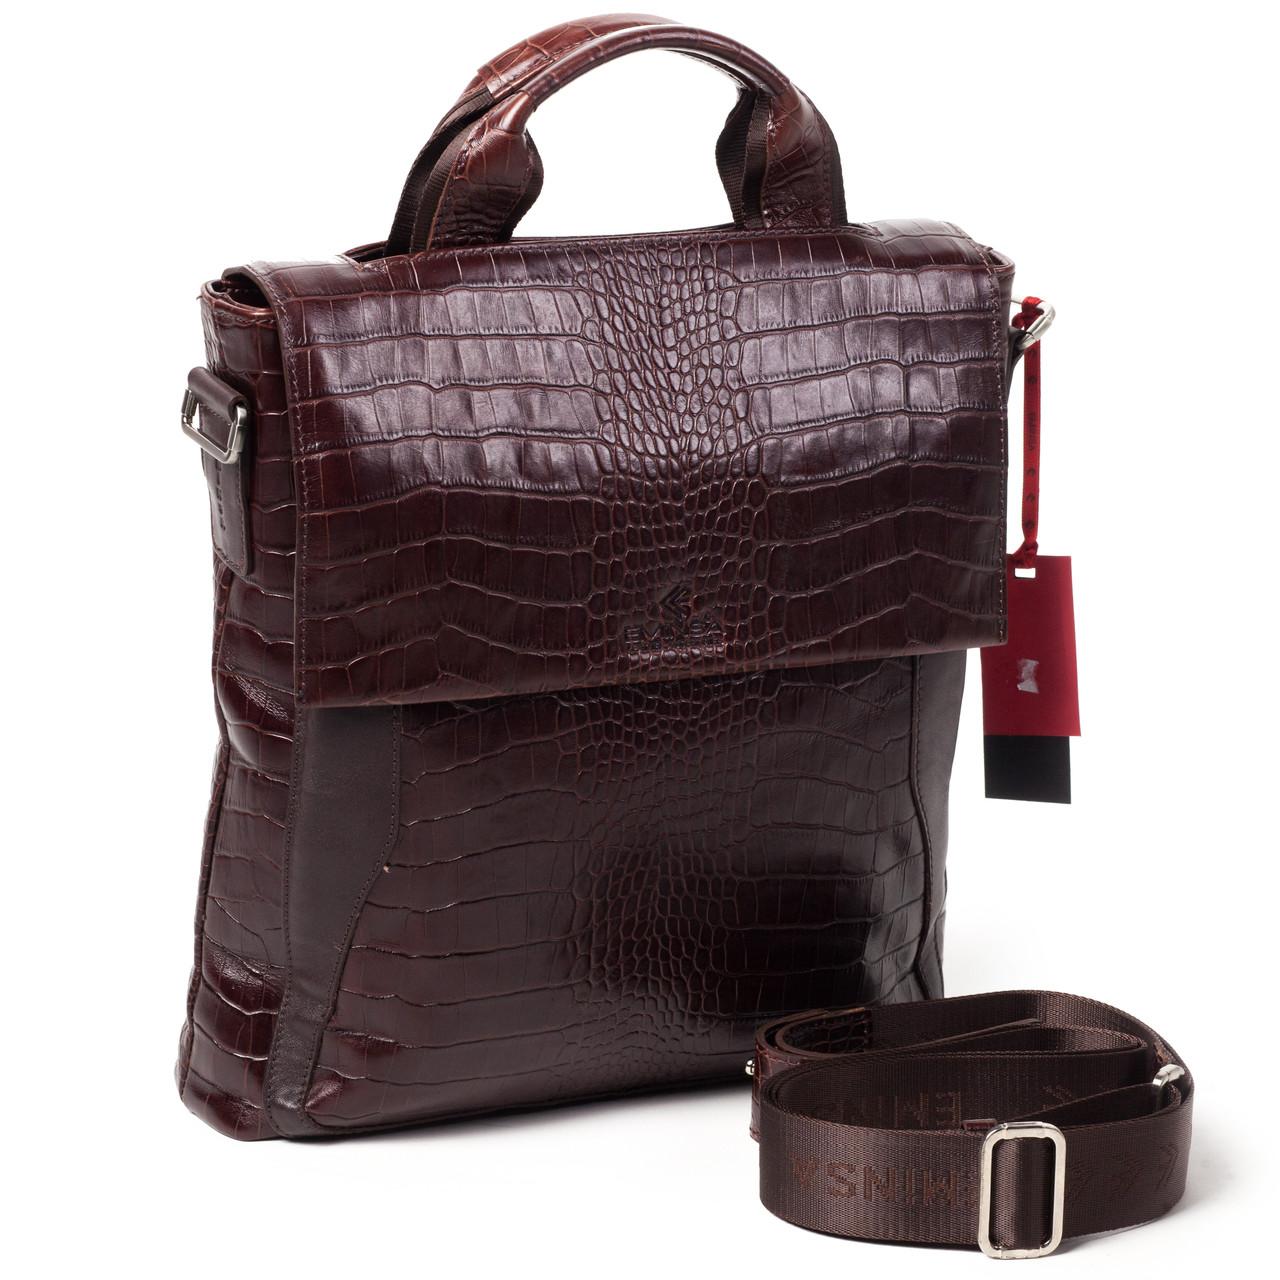 9ec1a4cbb893 Мужская сумка Eminsa 6019-4-3 кожаная коричневая : от